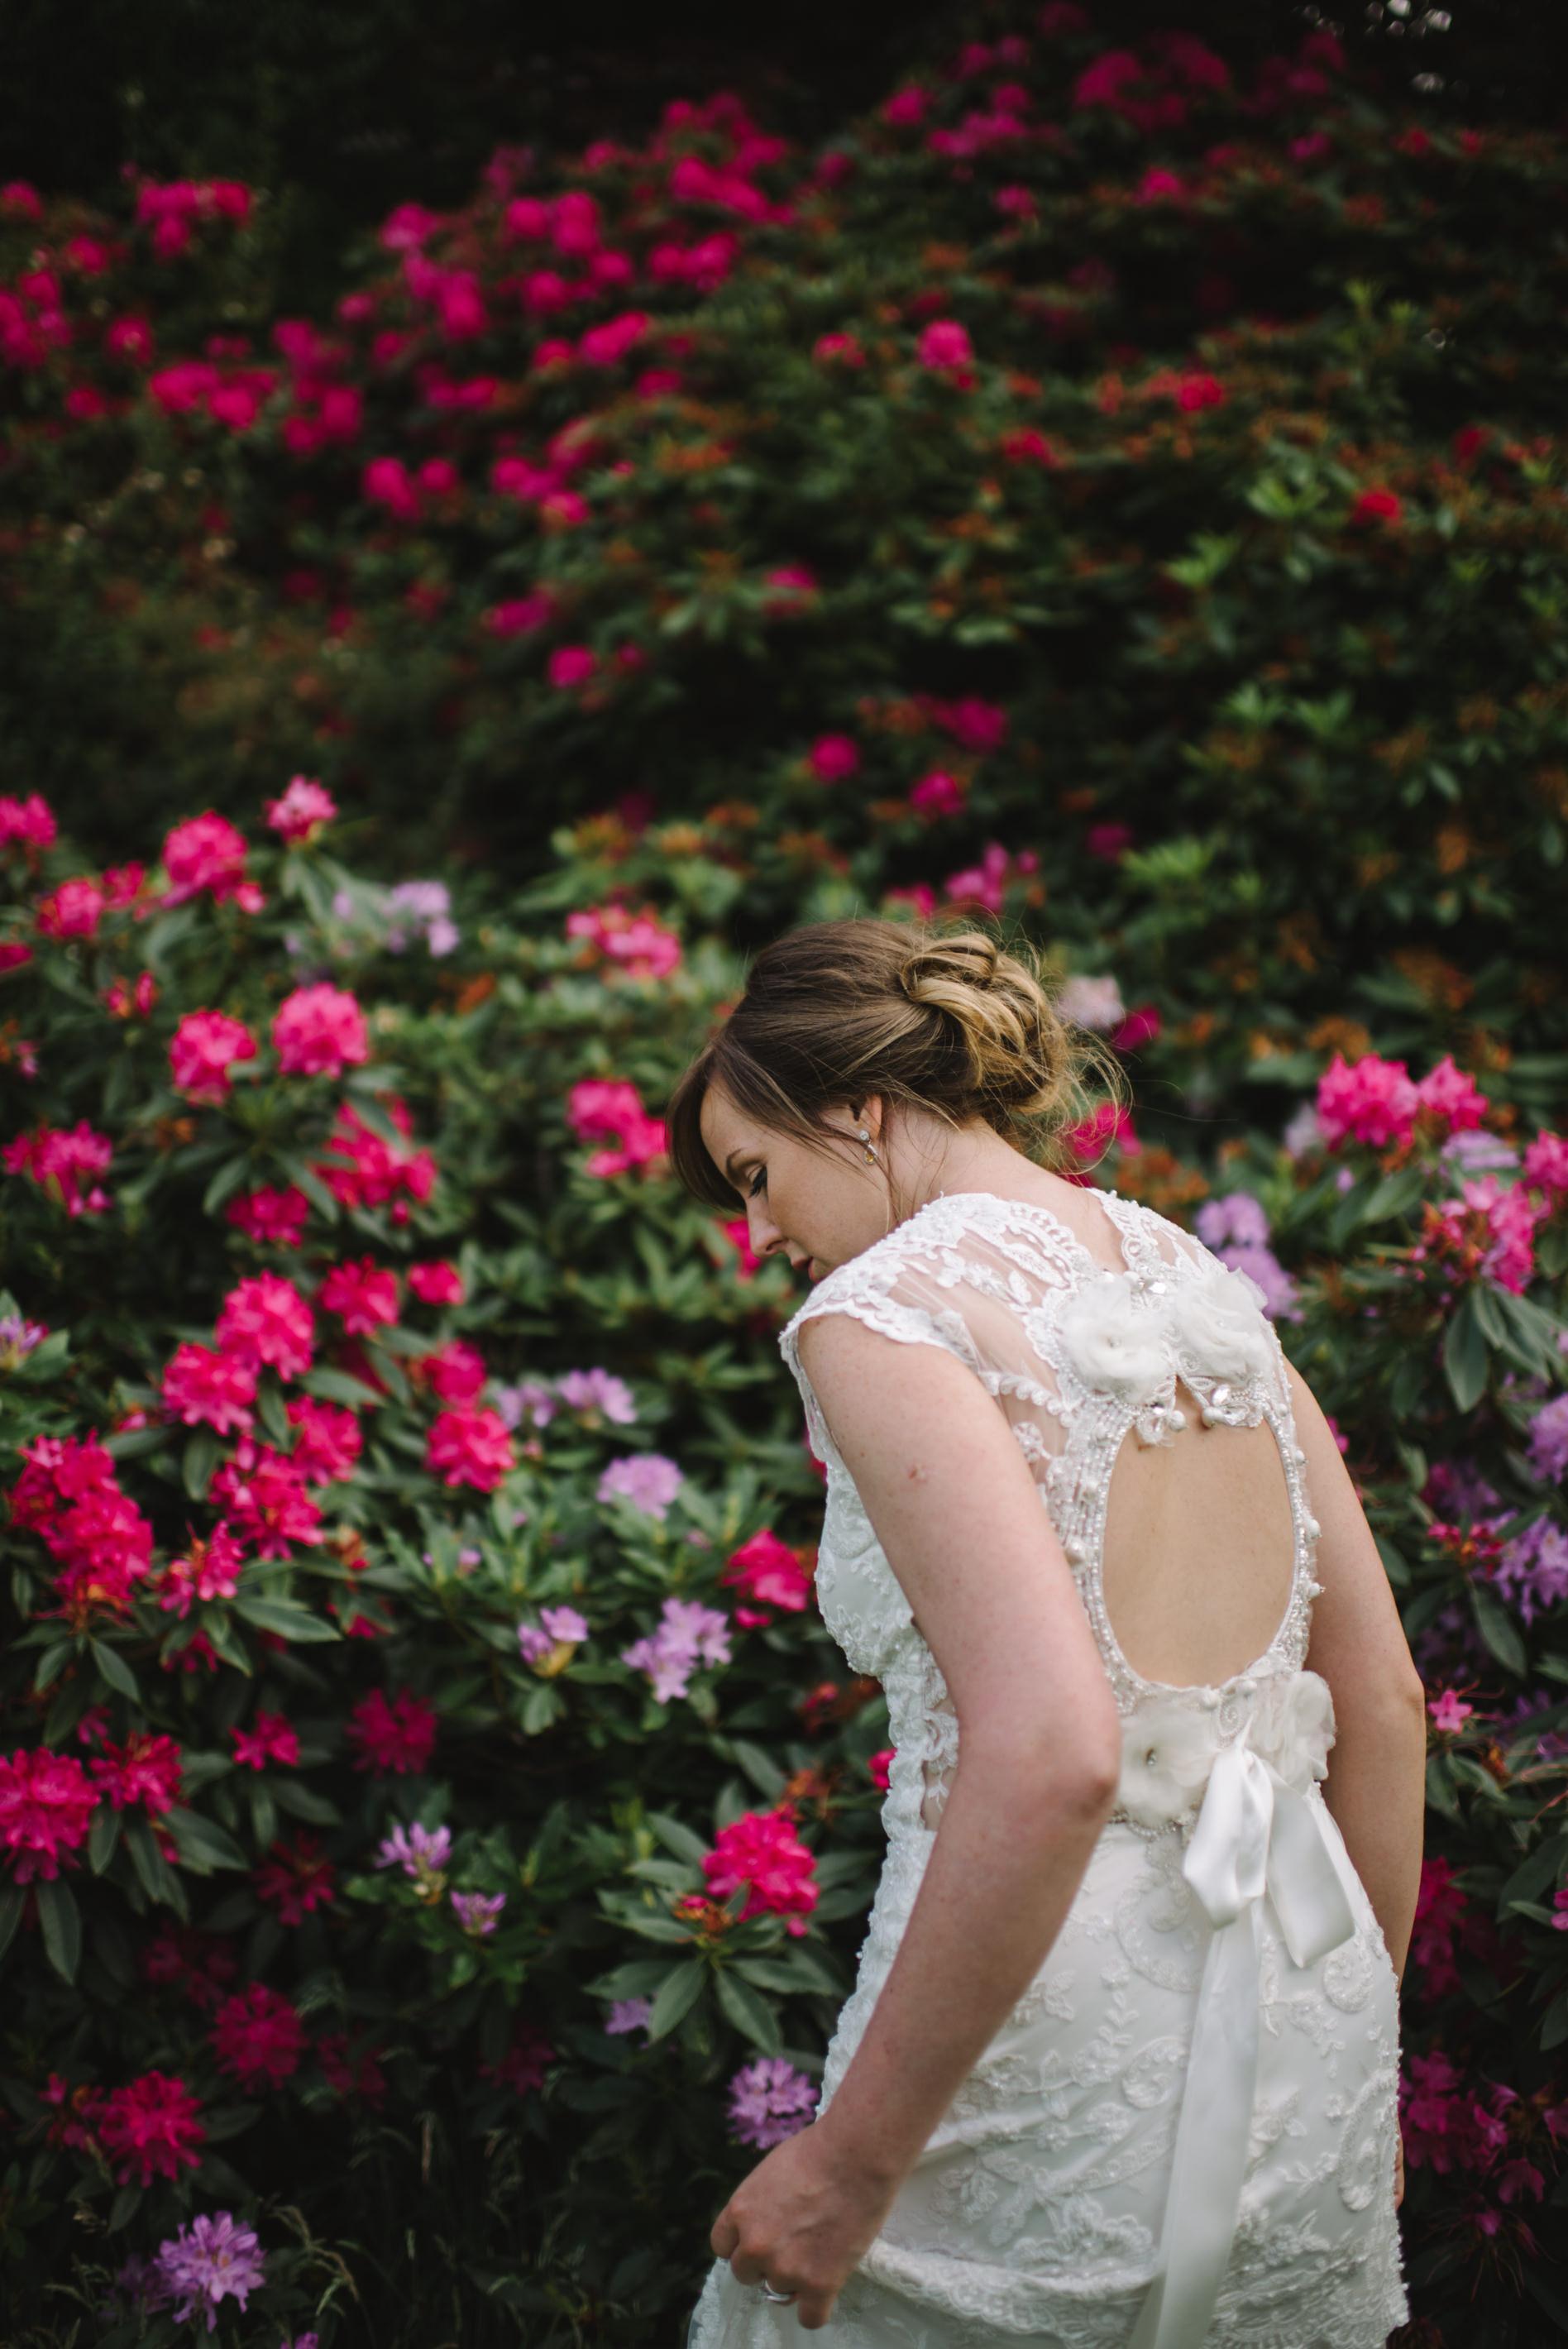 0010-LISA-DEVINE-PHOTOGRAPHY-ALTERNATIVE-WEDDING-PHOTOGRAPHY-SCOTLAND-DESTINATION-WEDDINGS-GLASGOW-WEDDINGS-COOL-WEDDINGS-STYLISH-WEDDINGS.JPG